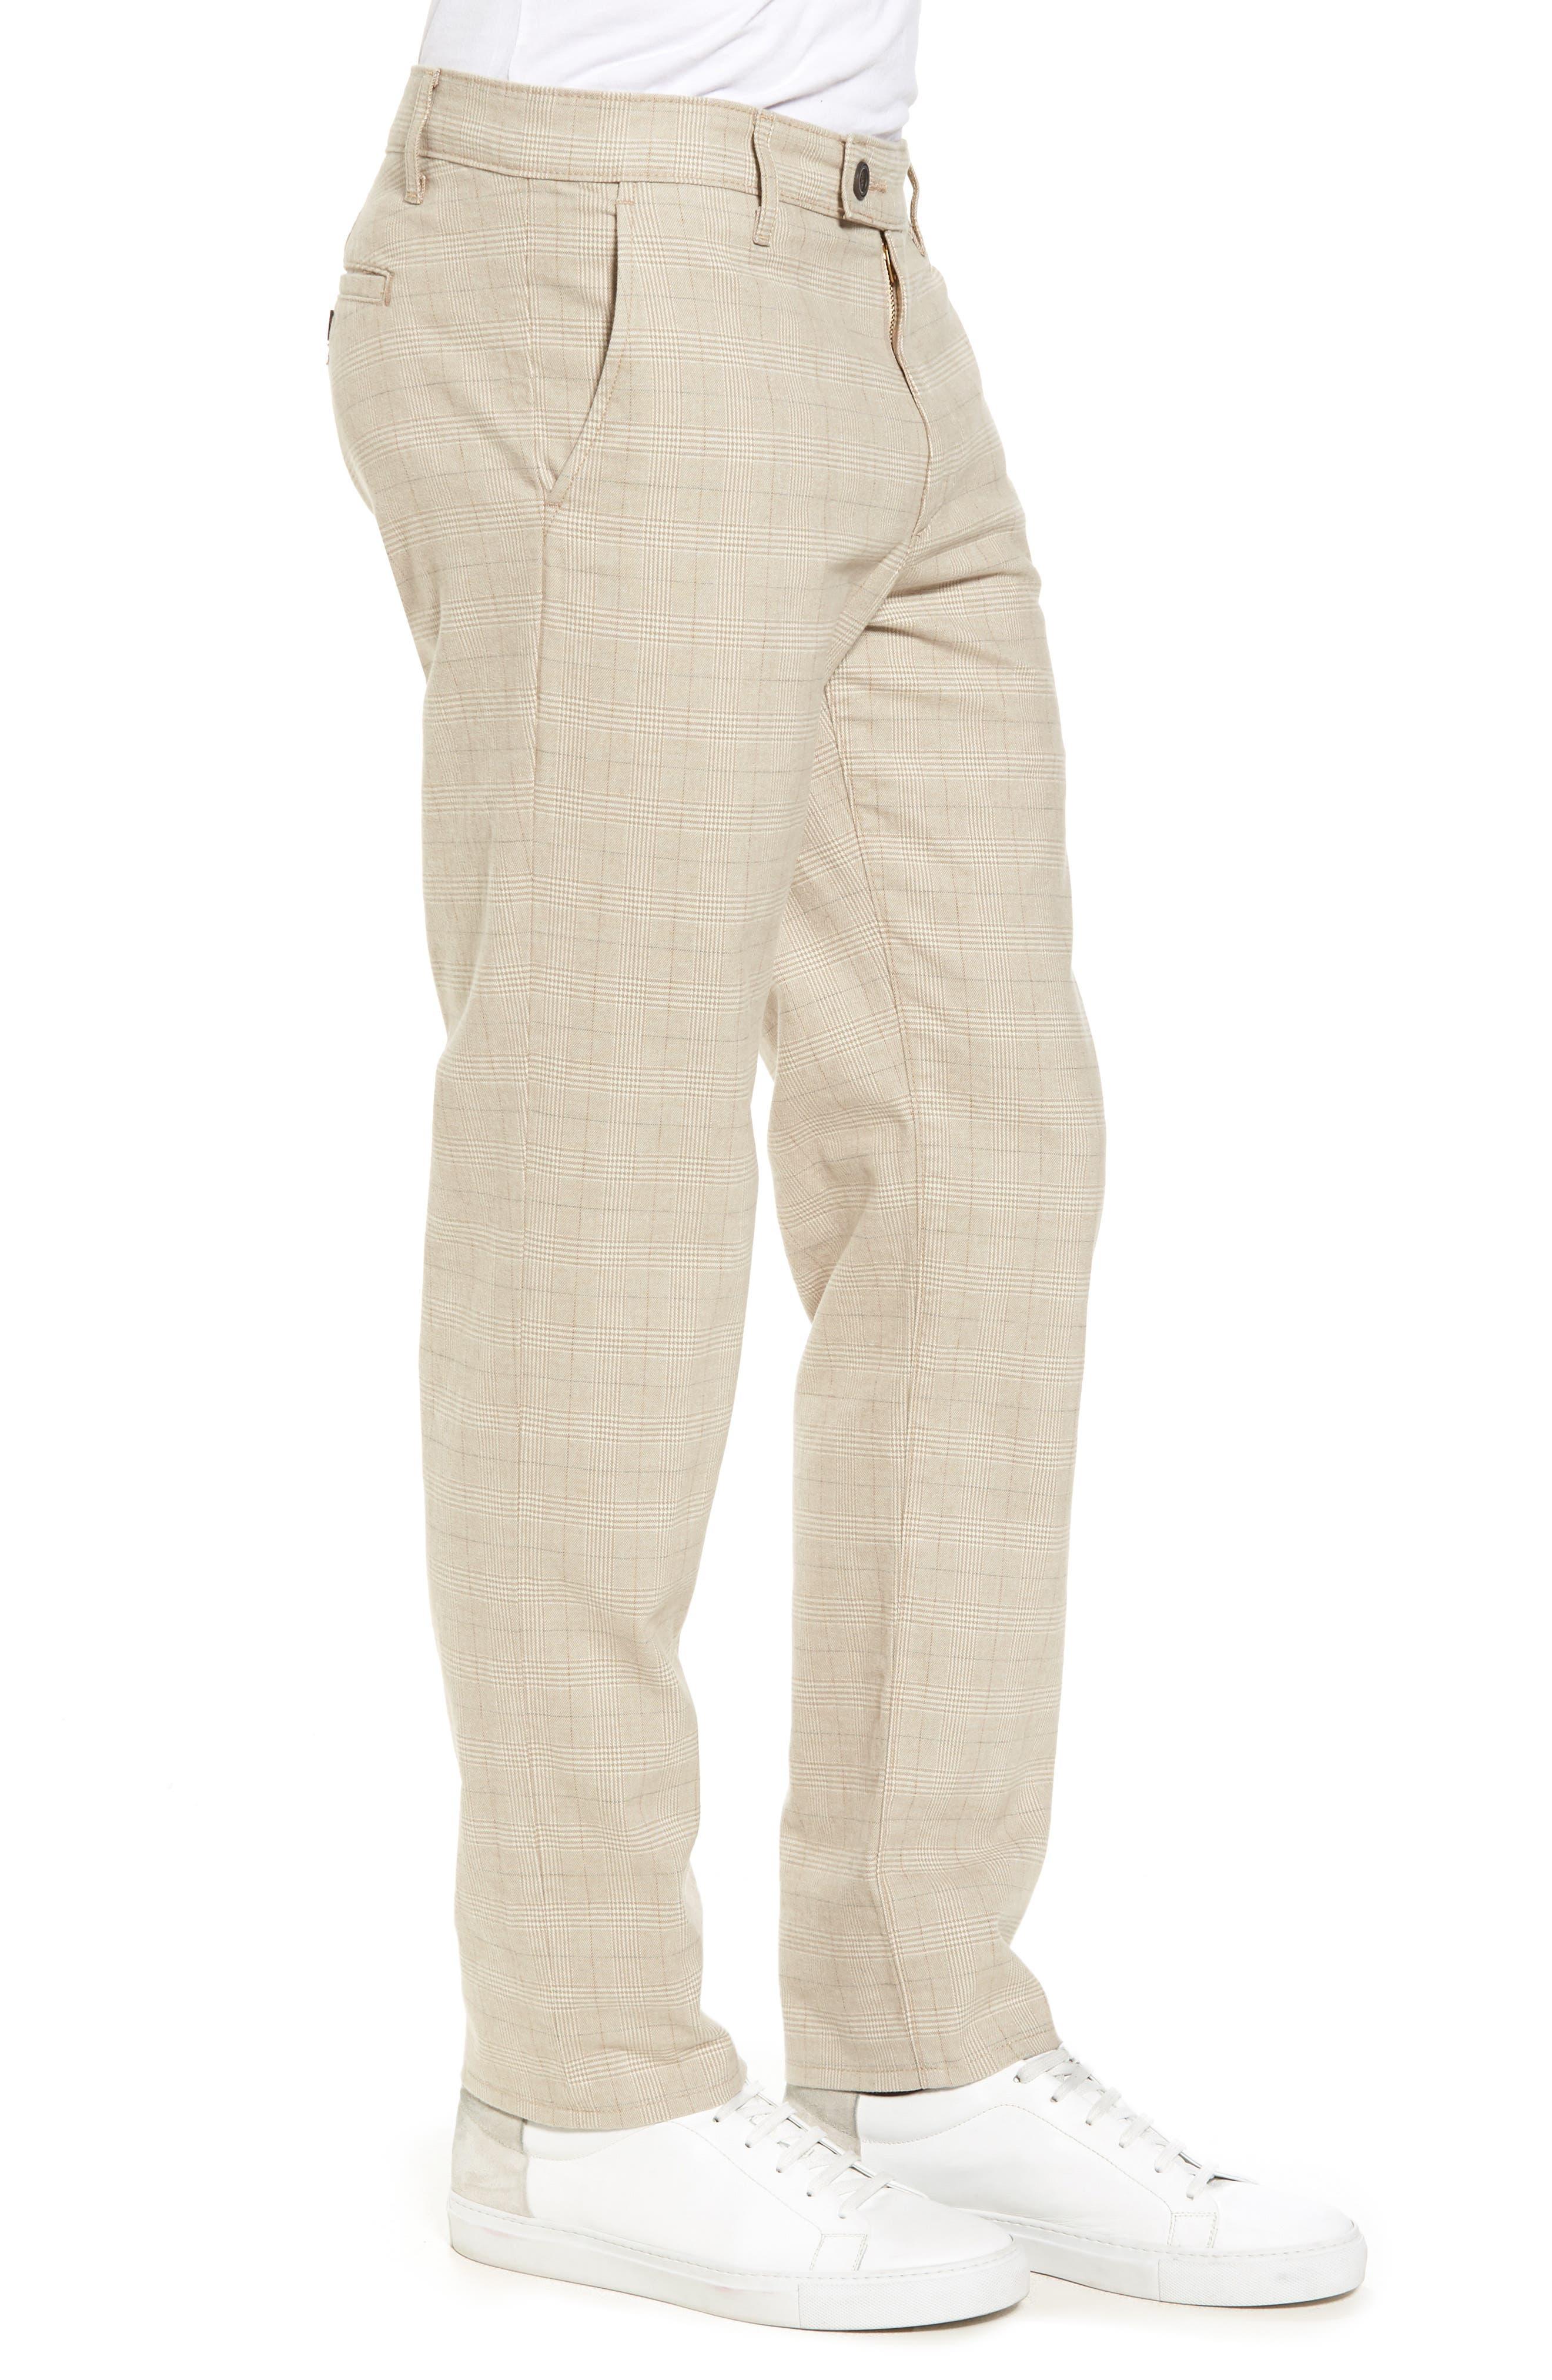 Marshall Slim Fit Pants,                             Alternate thumbnail 3, color,                             Silica Sand